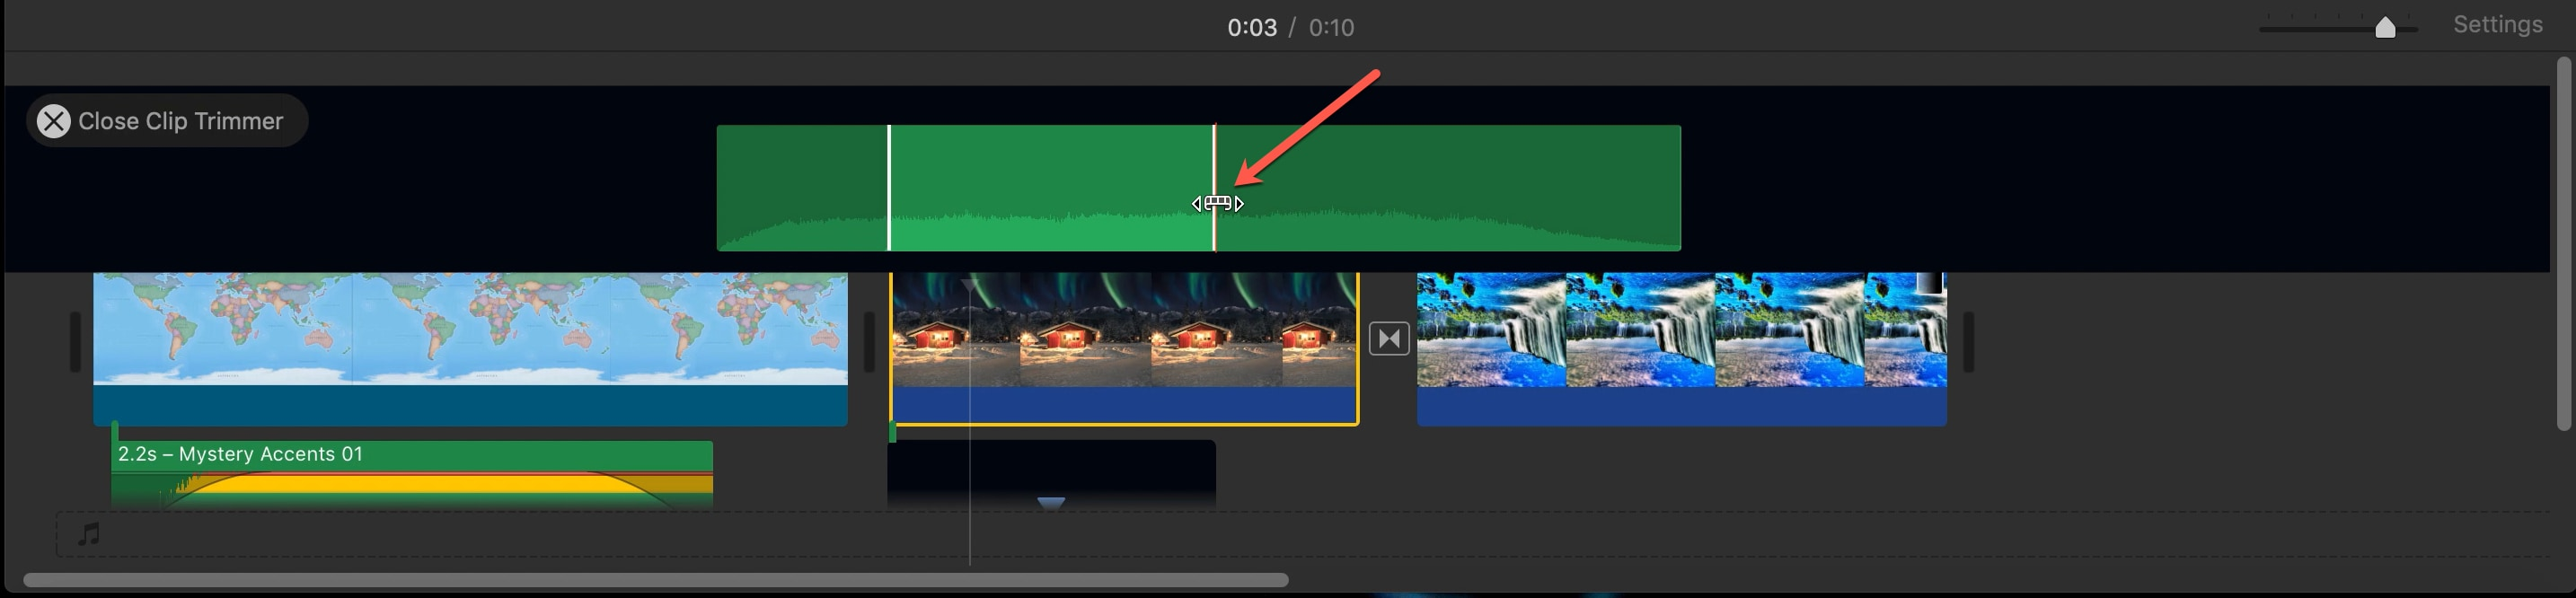 Clip Trimmer Film Audio Clip iMovie Mac